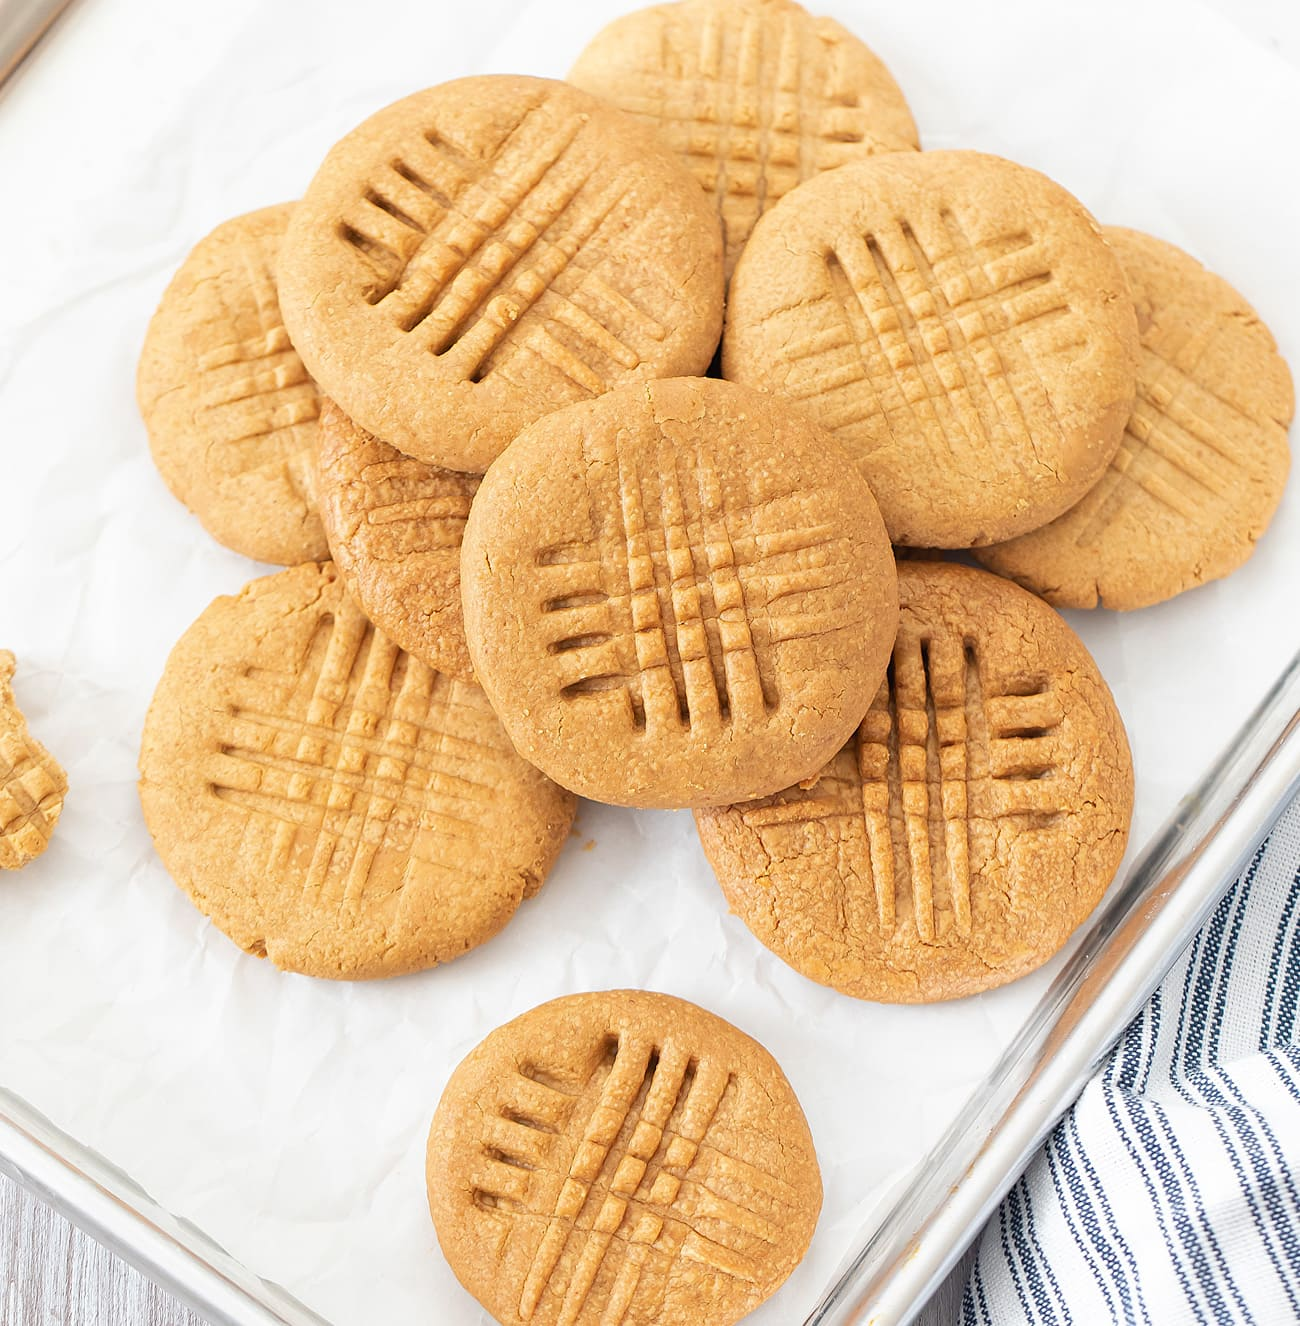 20 Ingredient Healthy Peanut Butter Cookies